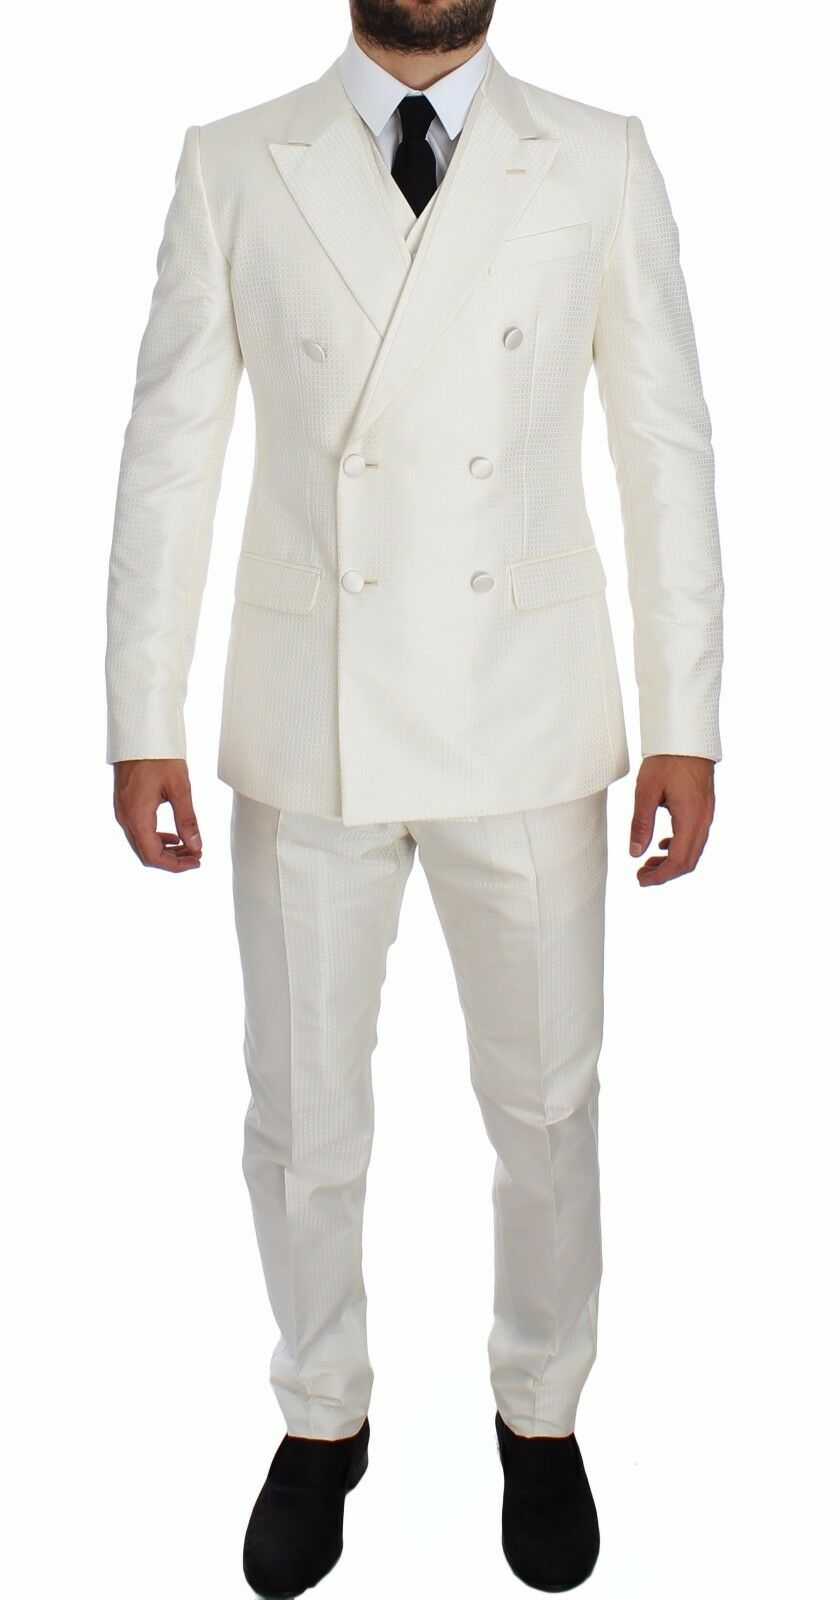 NWT 3200 DOLCE & GABBANA Weiß Silk Double Breasted 3 Piece Suit EU48 / US38 /M